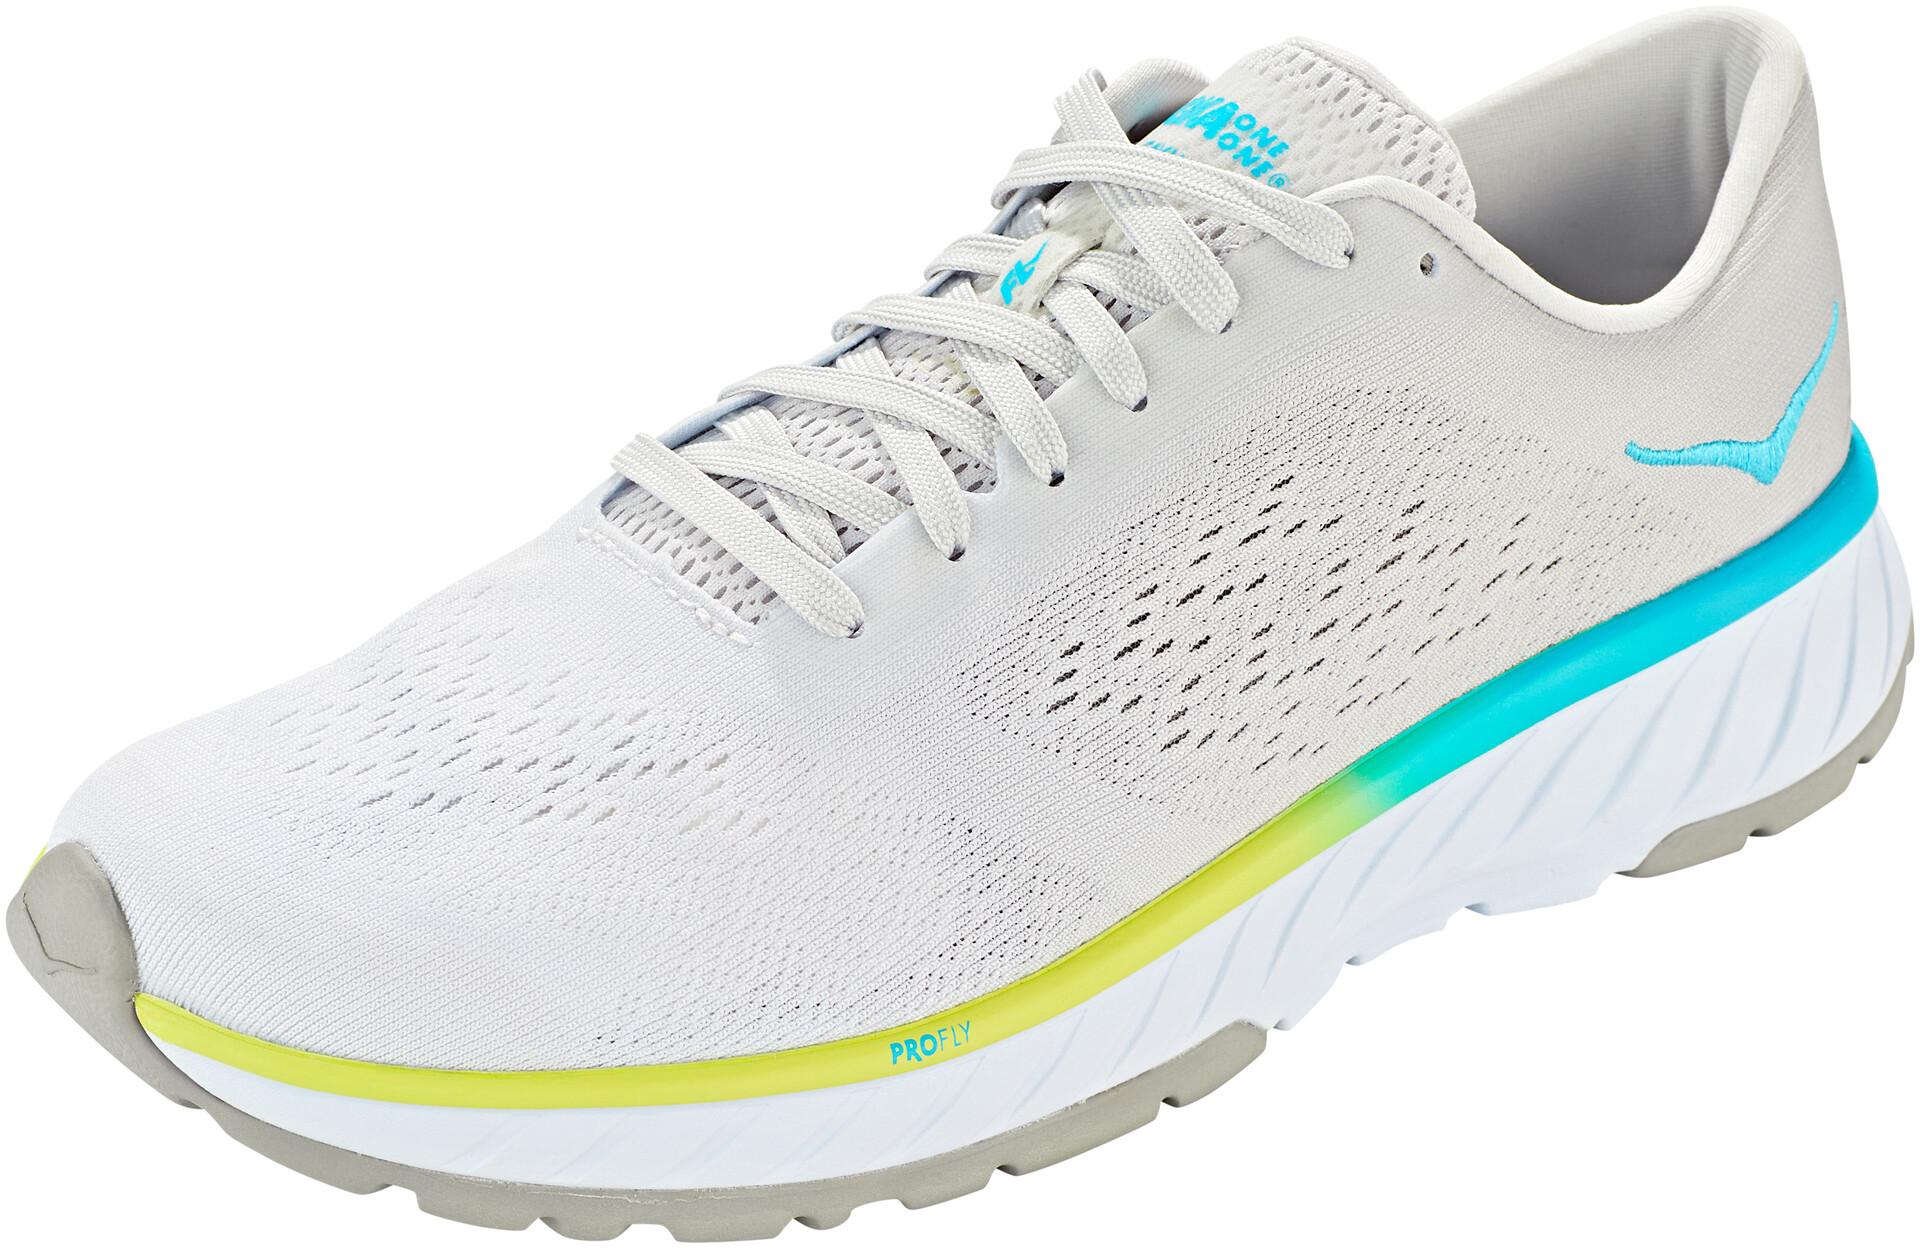 Hoka One One Cavu 2 Running Shoes Women